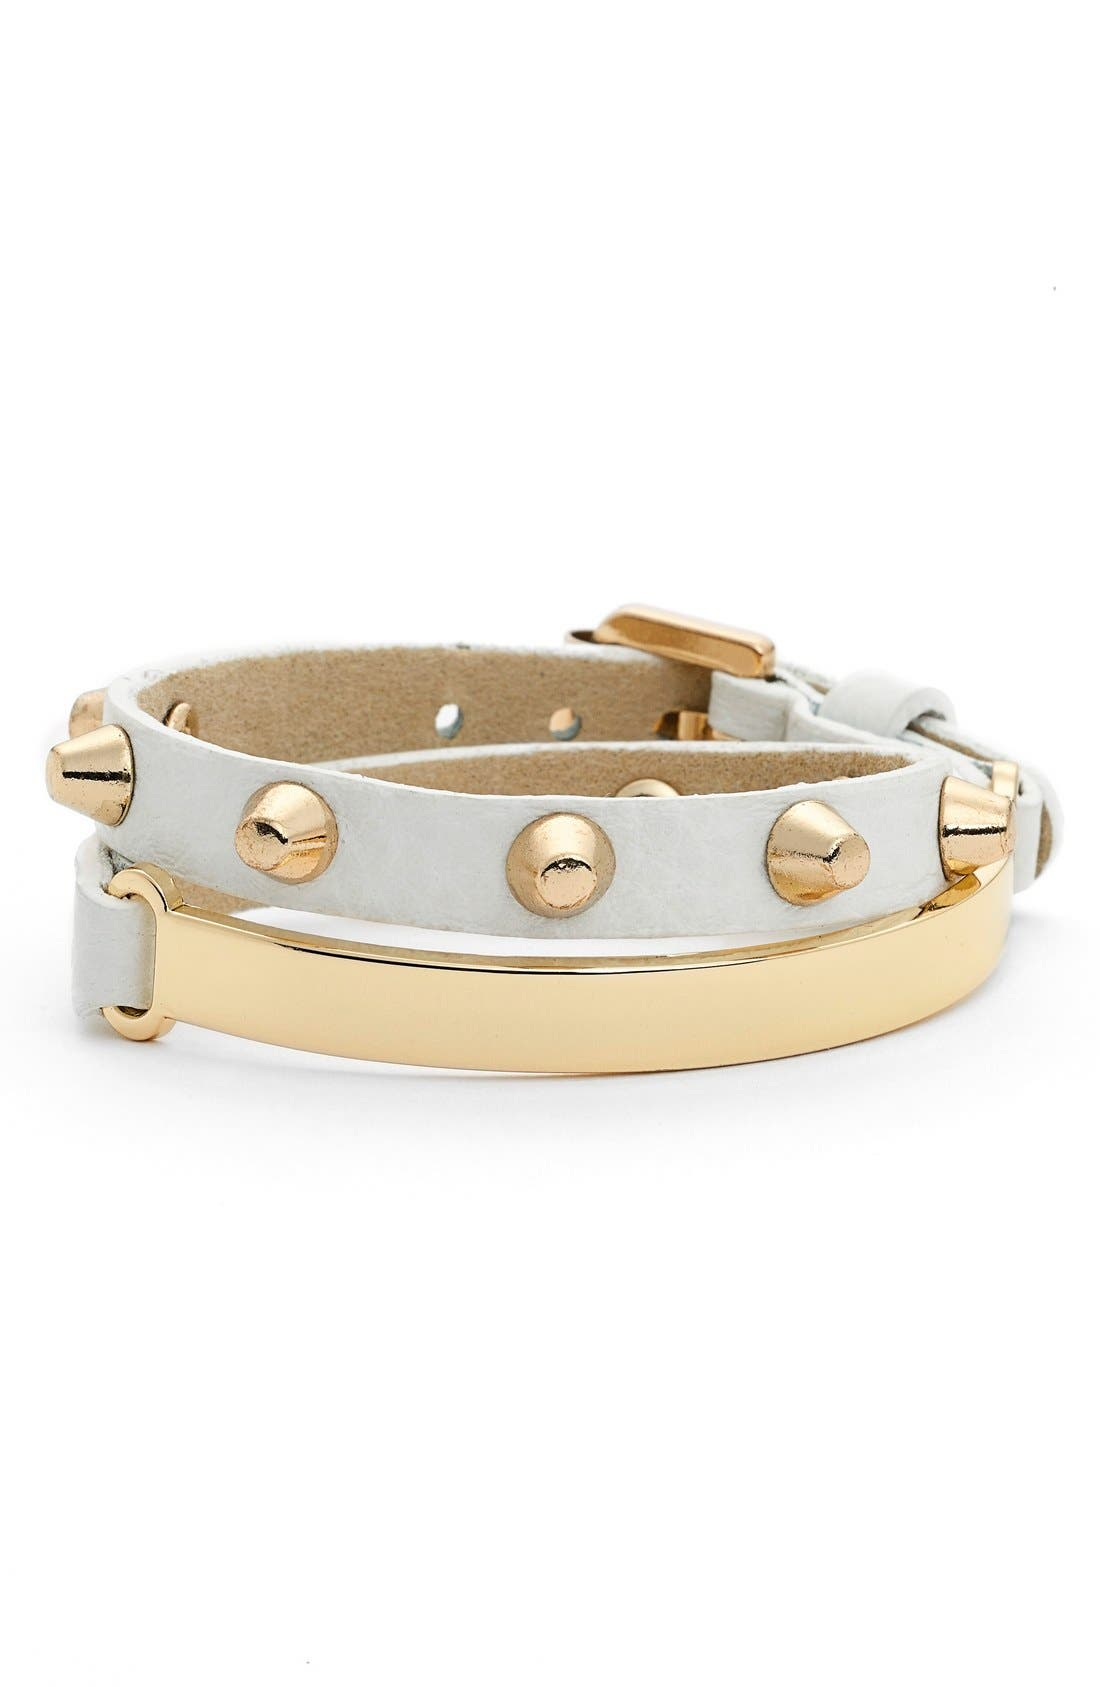 Alternate Image 1 Selected - Jules Smith Studded Wrap Bracelet